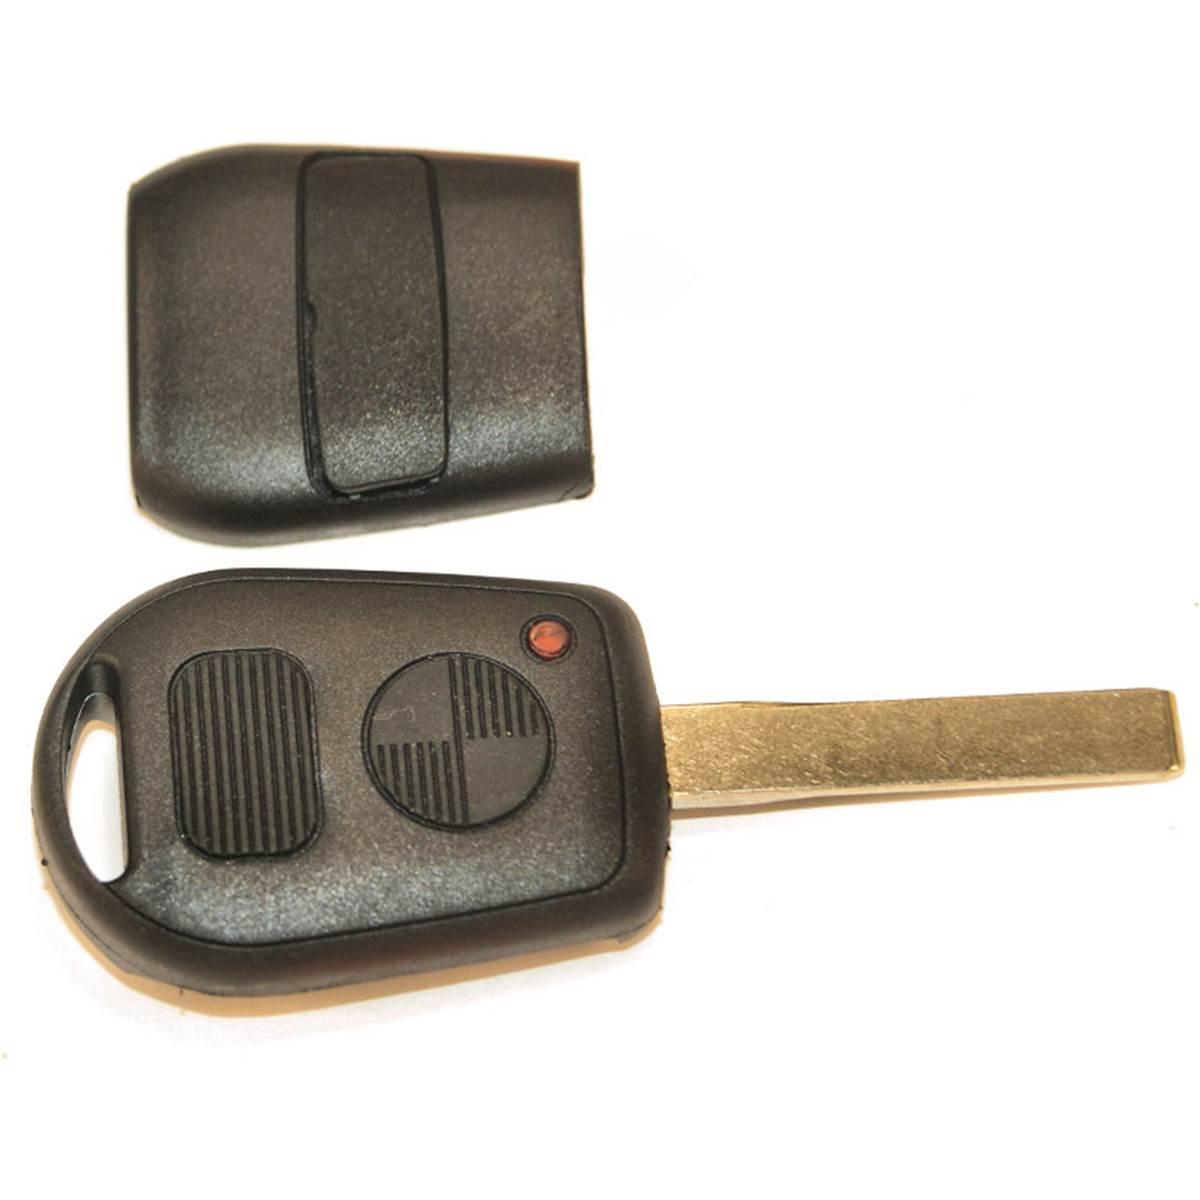 Coque de clé pour BMW BMW25